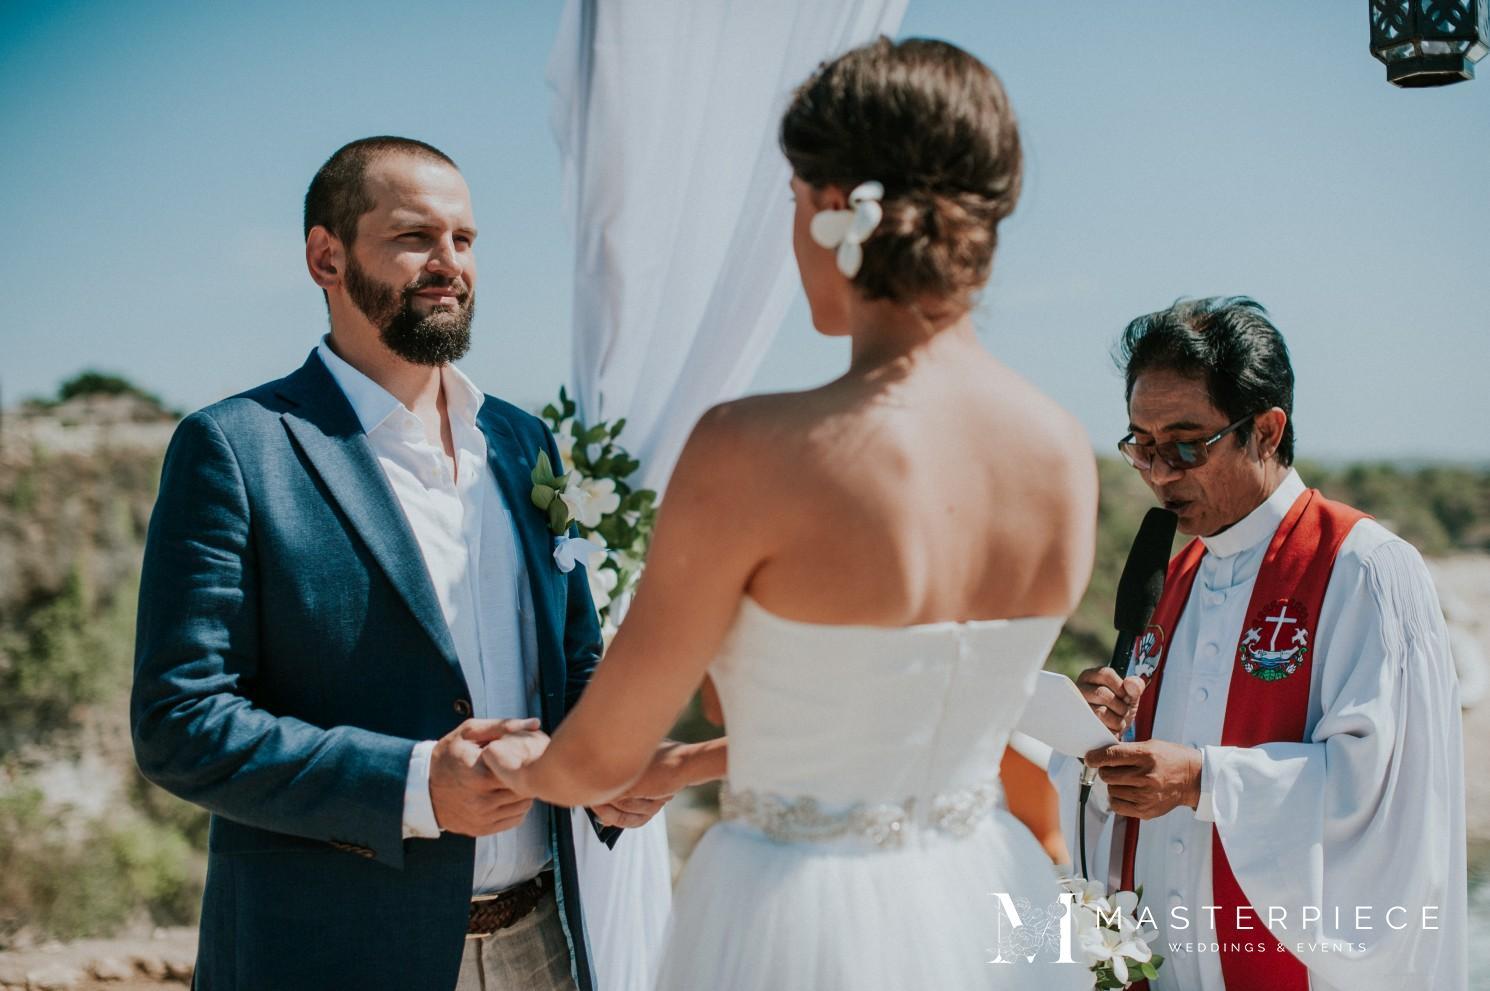 Masterpiece_Weddings_sluby_023